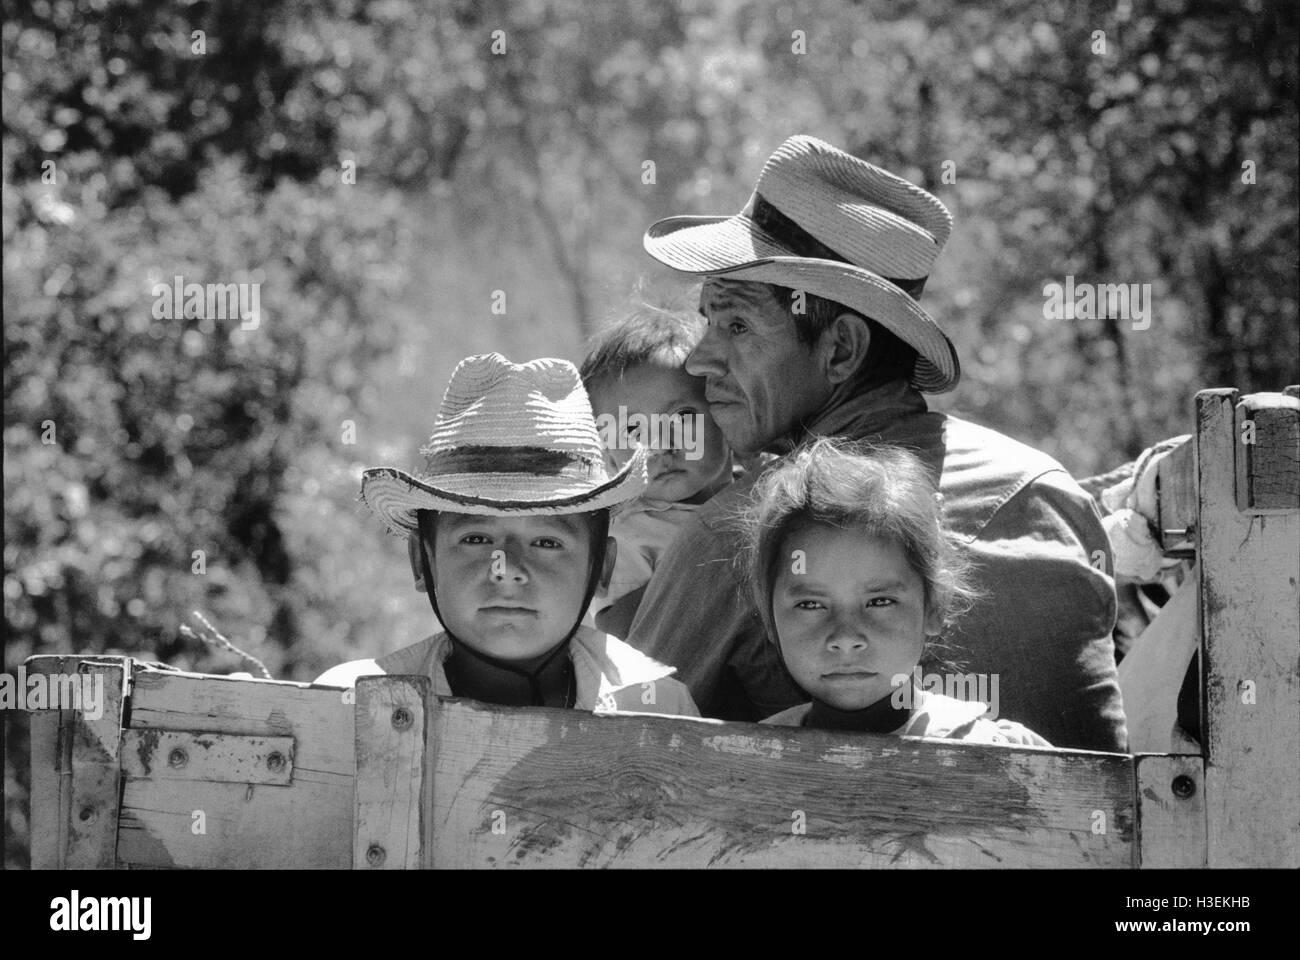 SAN SALVADOR, EL SALVADOR, FEB 1990 Salvadoran refugees return home to Morazan province after nine years across - Stock Image